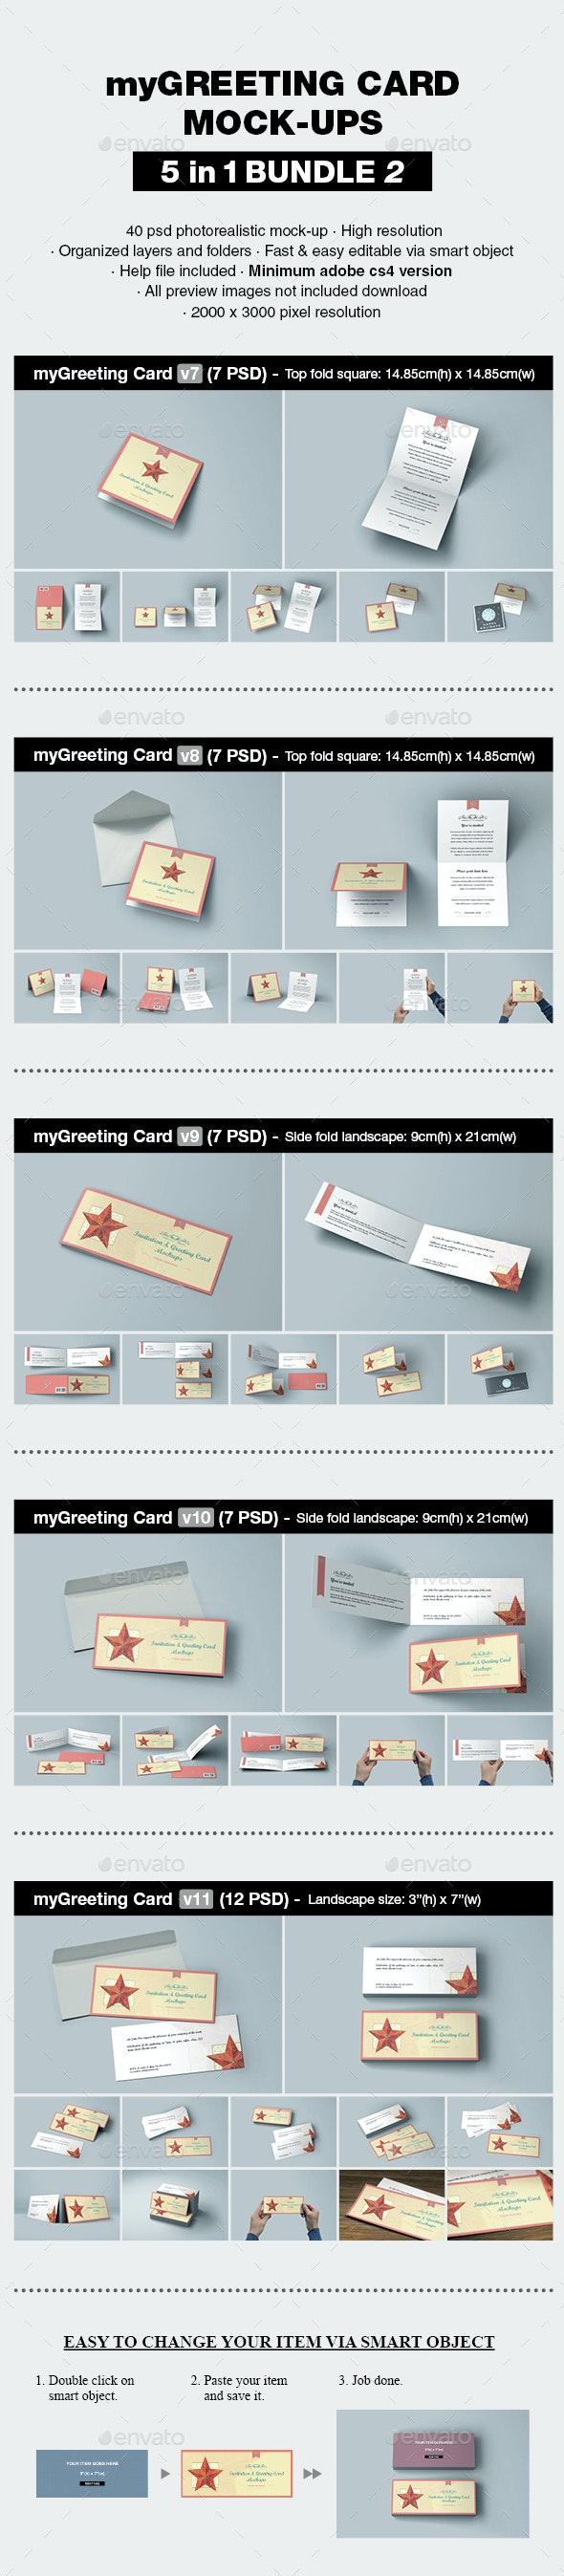 myGreeting Card Mock-up Bundle 2 - Print Product Mock-Ups